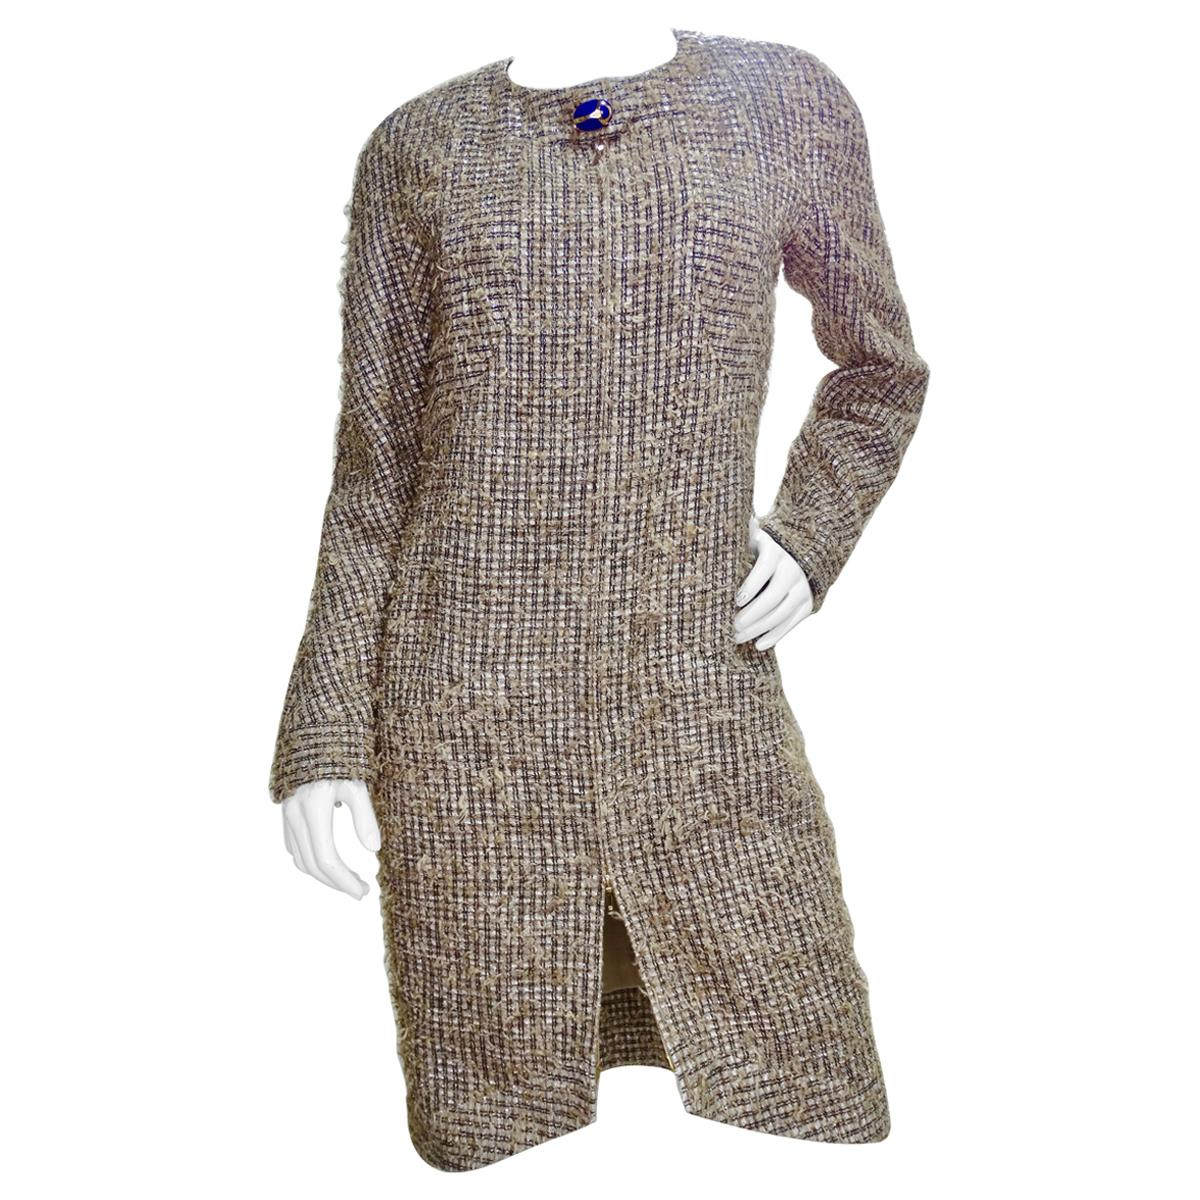 Chanel 2019 Pre-Fall Scarab Beetle Tweed Dress